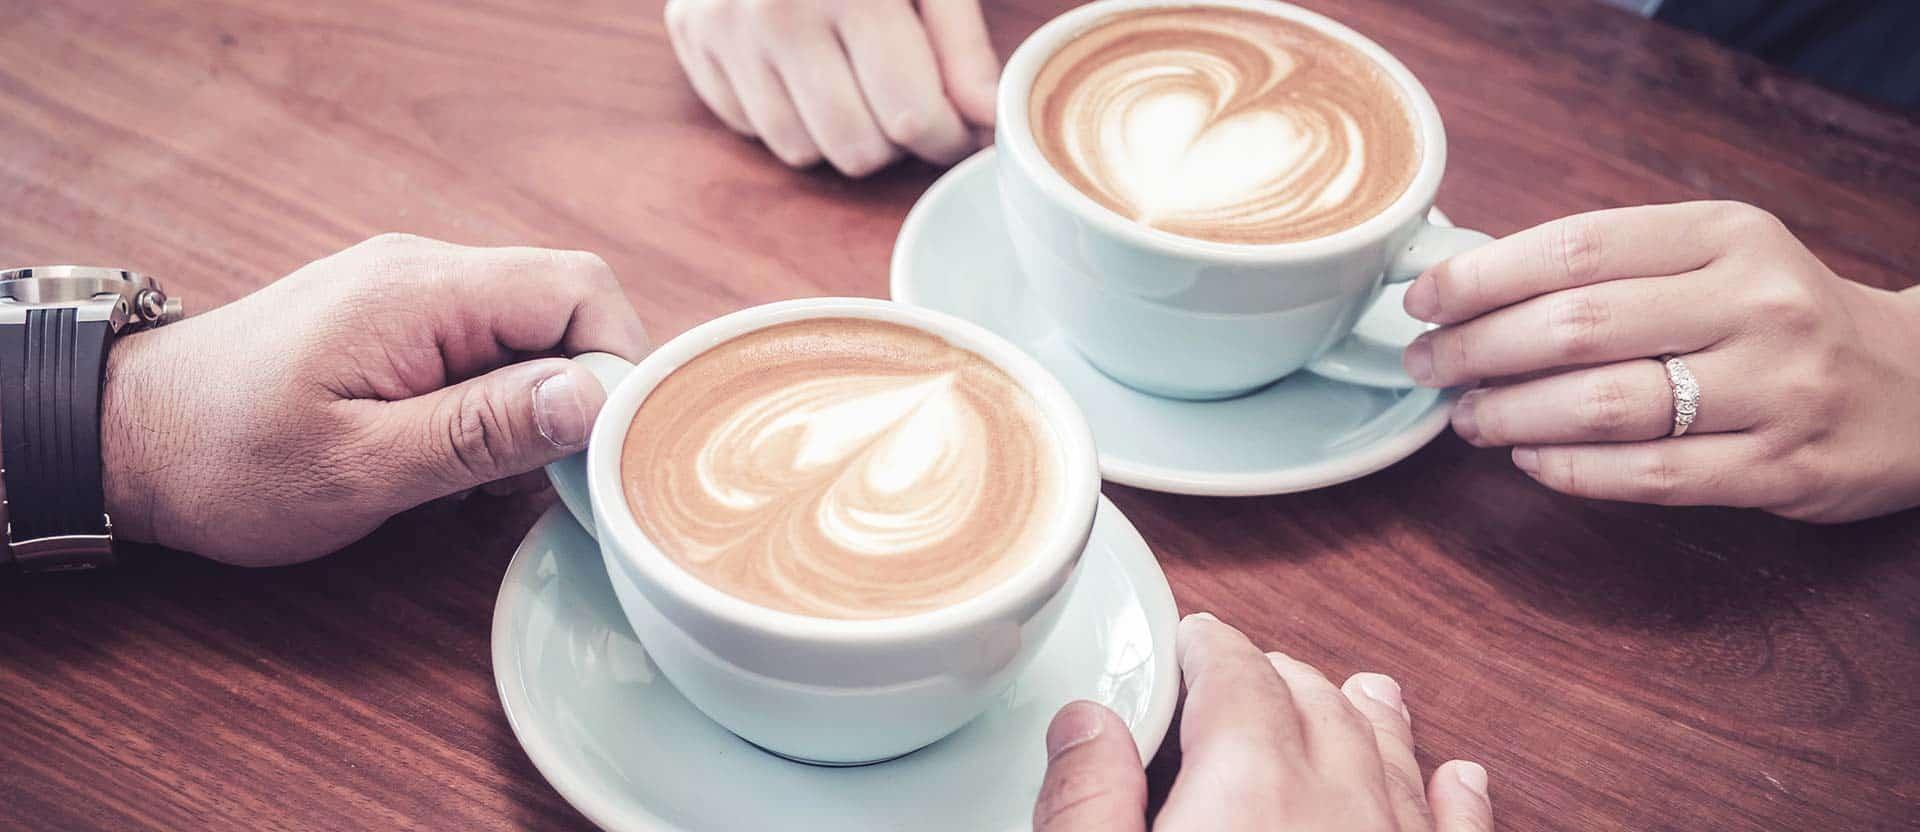 koffie en een babbeltje